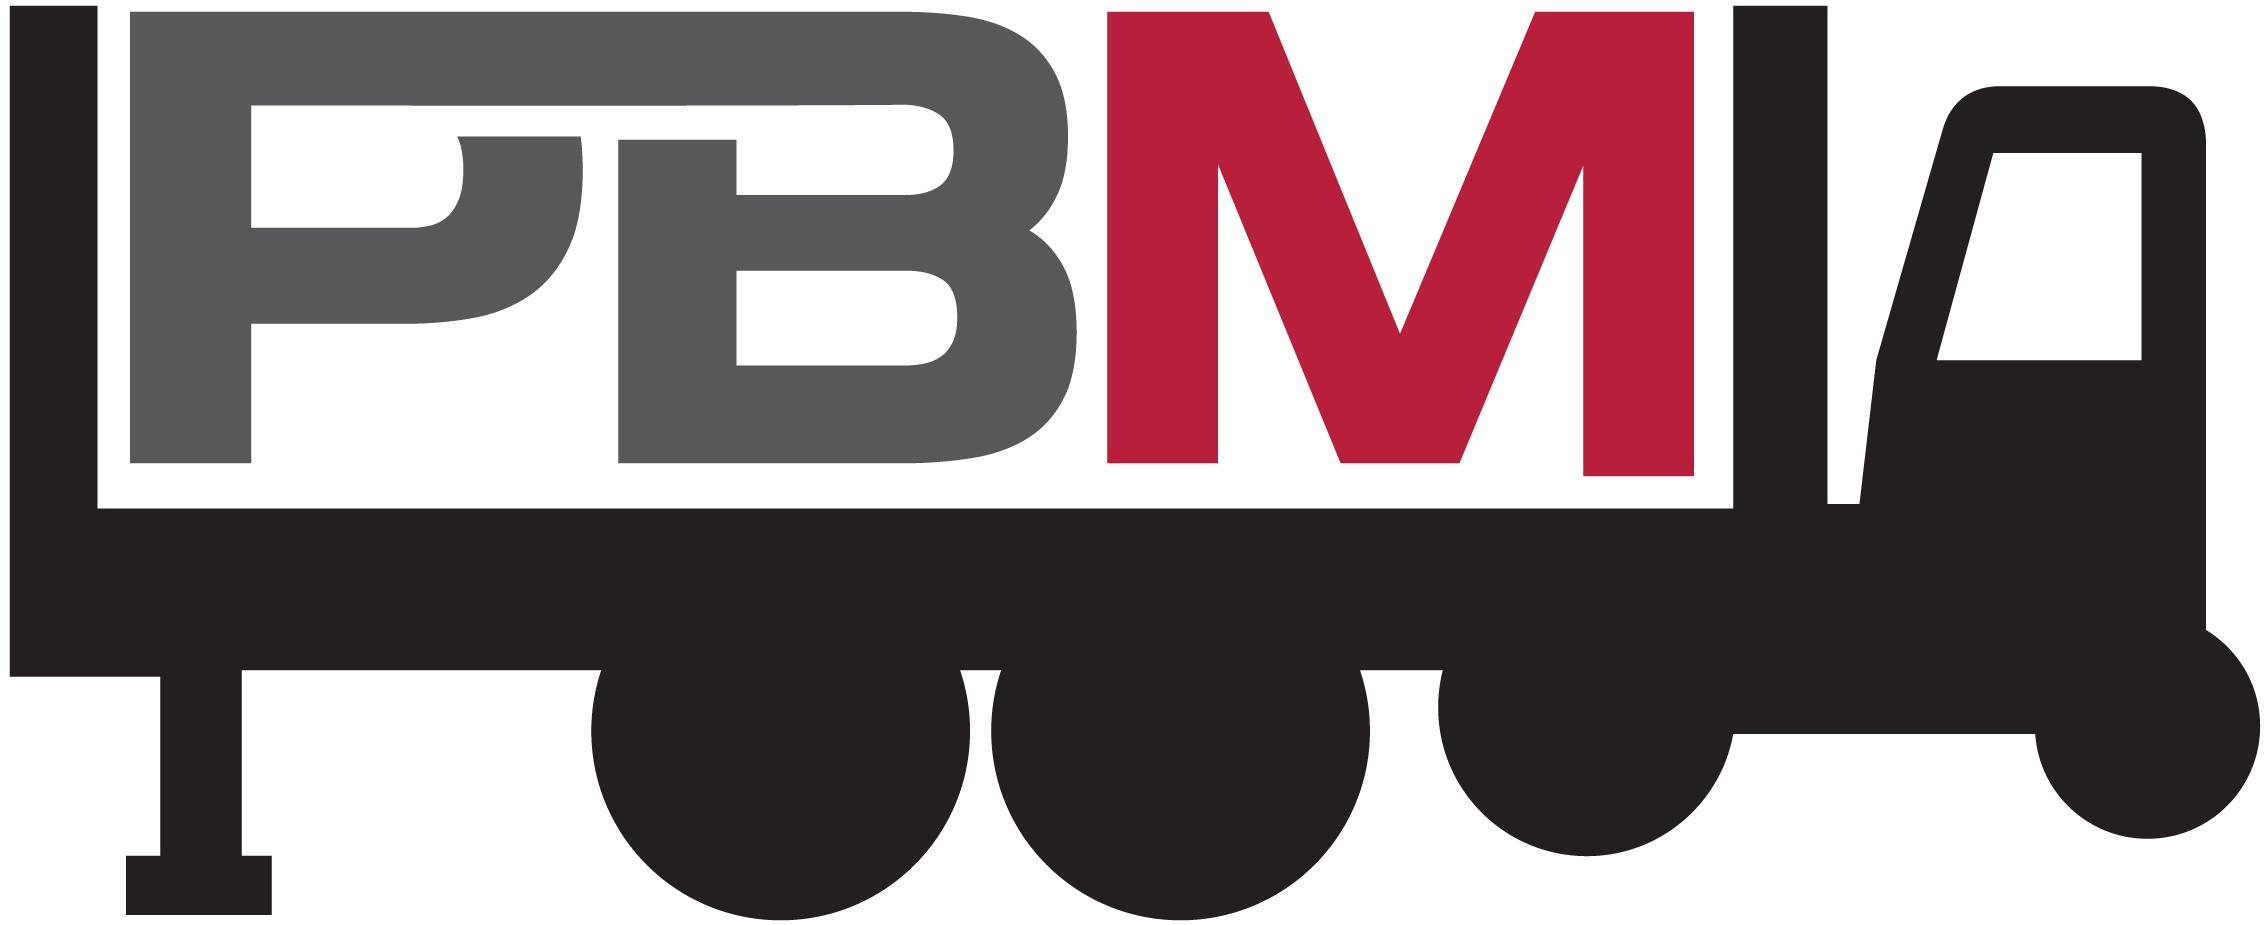 PBM_2018.png